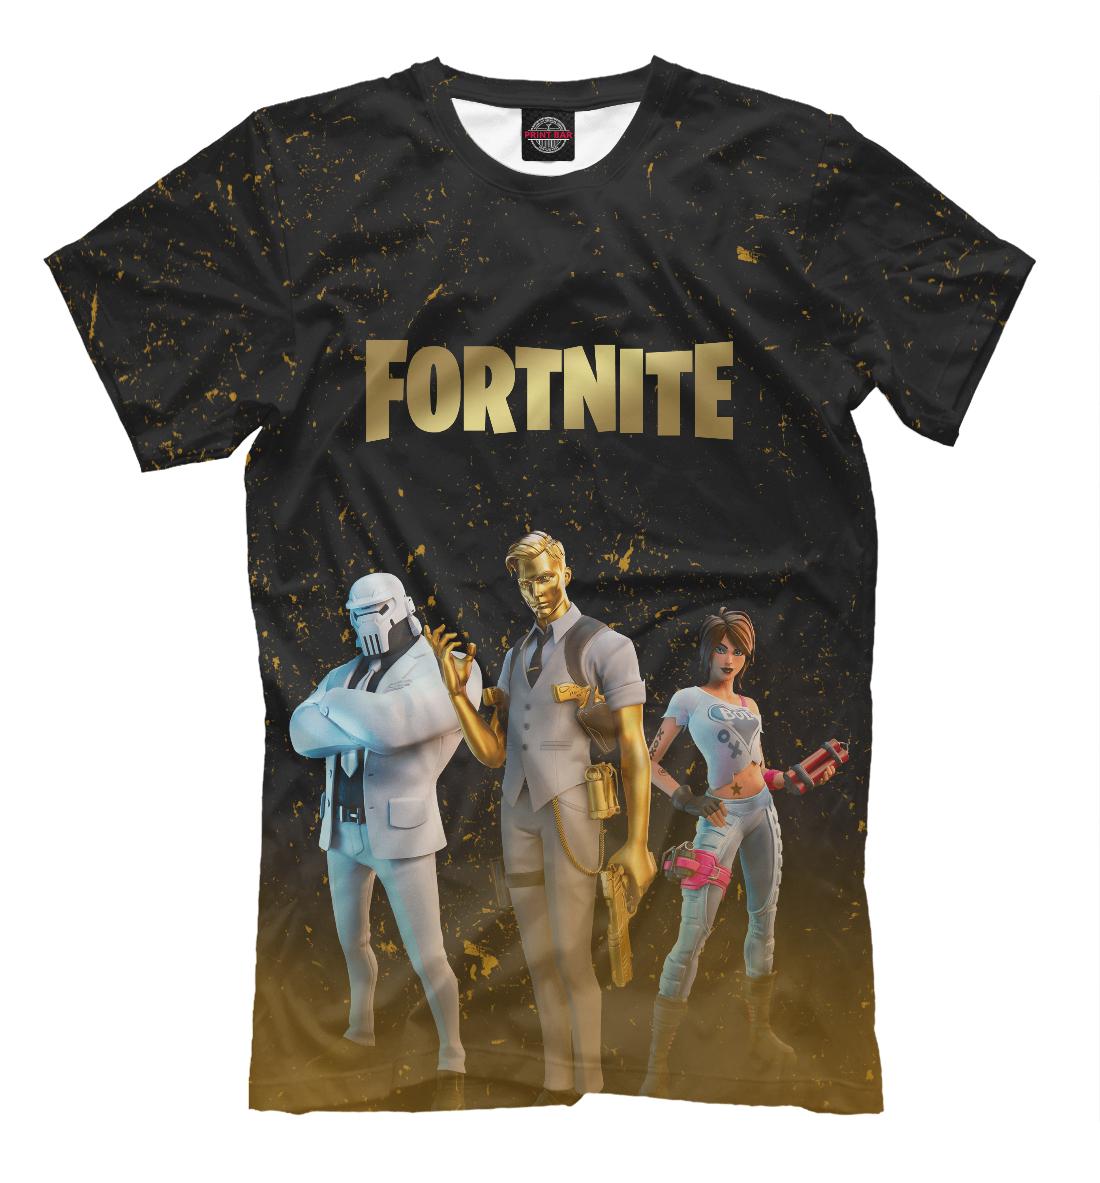 Fortnite 2 Сезон (Глава 2) soeks 2